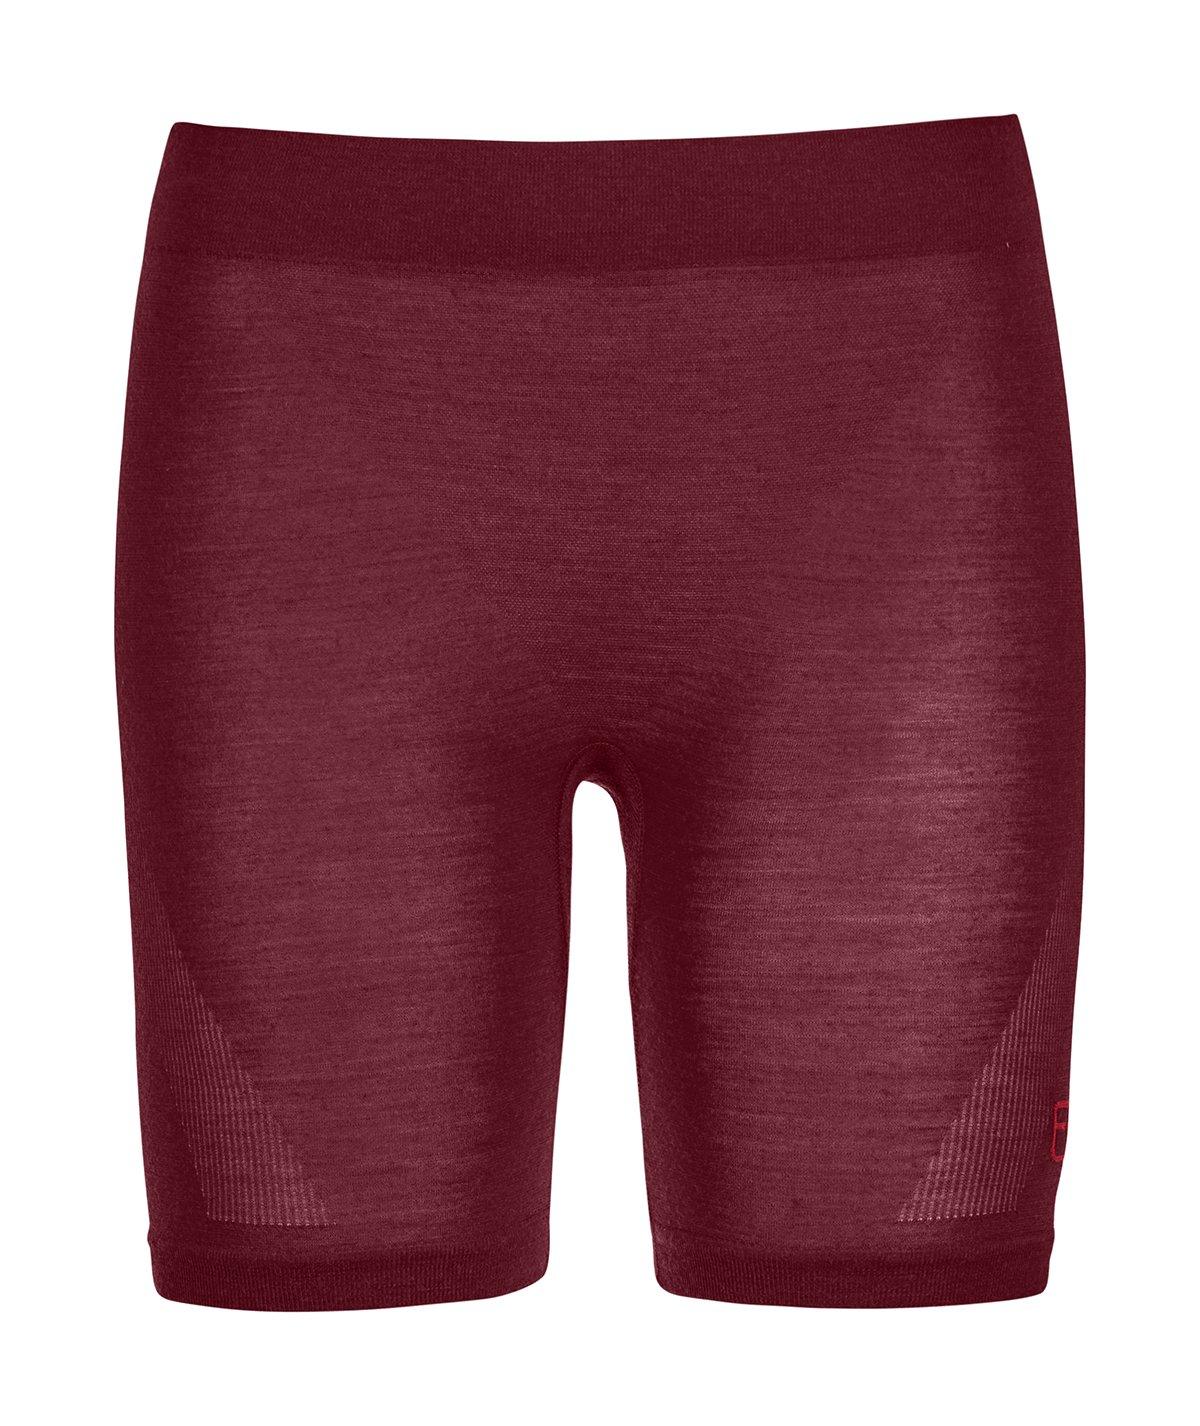 ORTOVOX - šortky W's 120 Competition Light Short Pants dark blood Velikost: XS